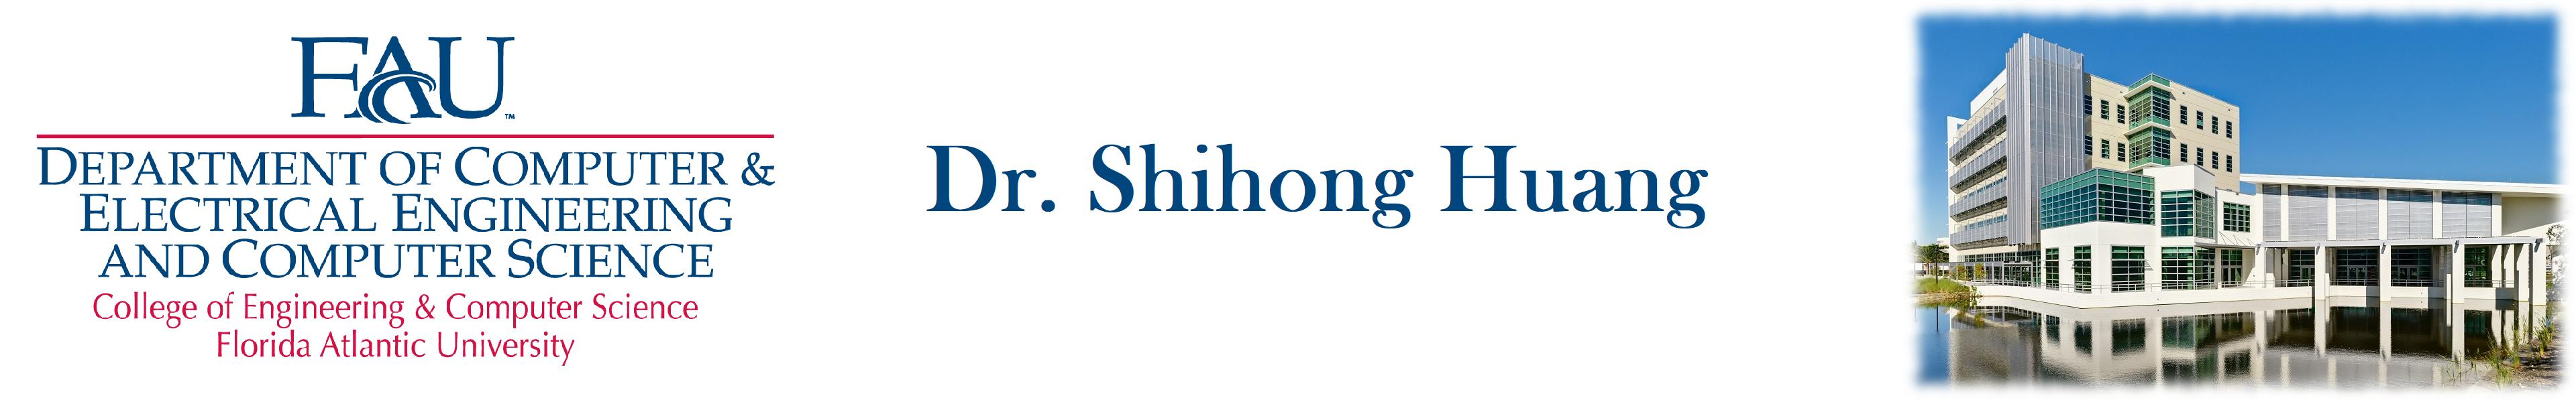 Dr. Shihong Huang